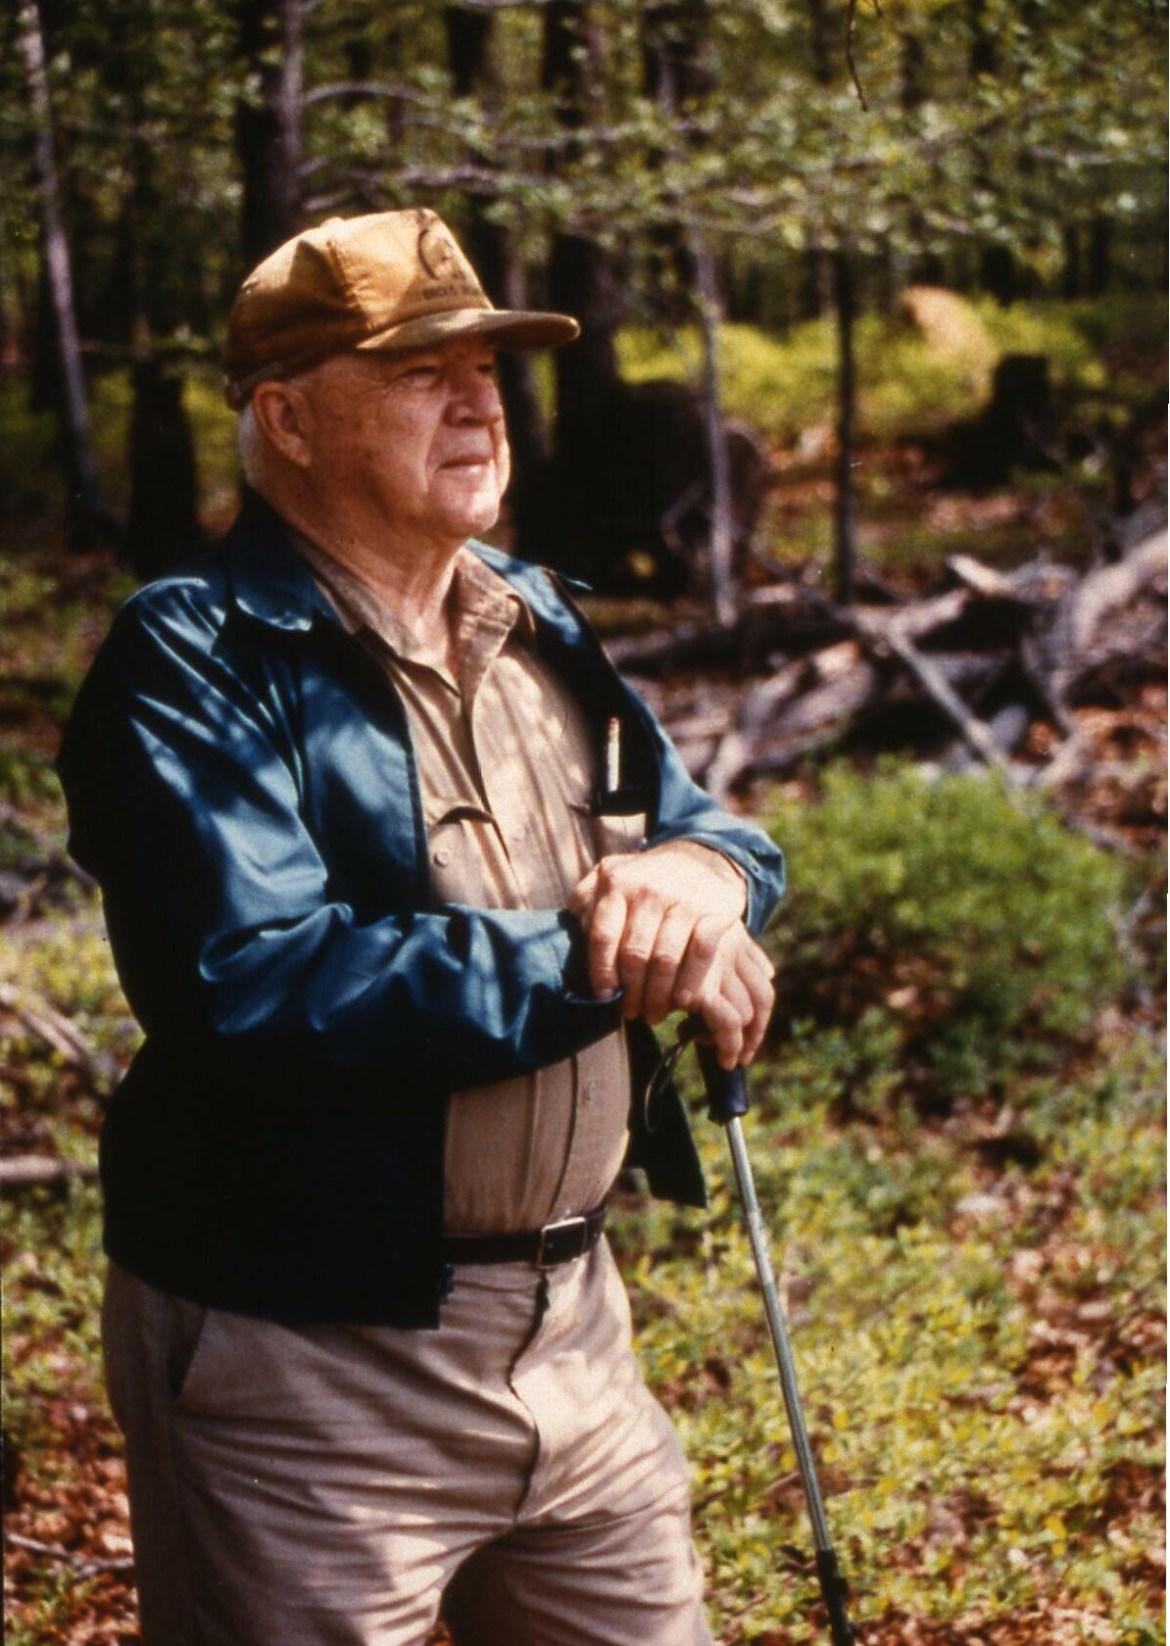 Charlie Nehf - hat and walking stick